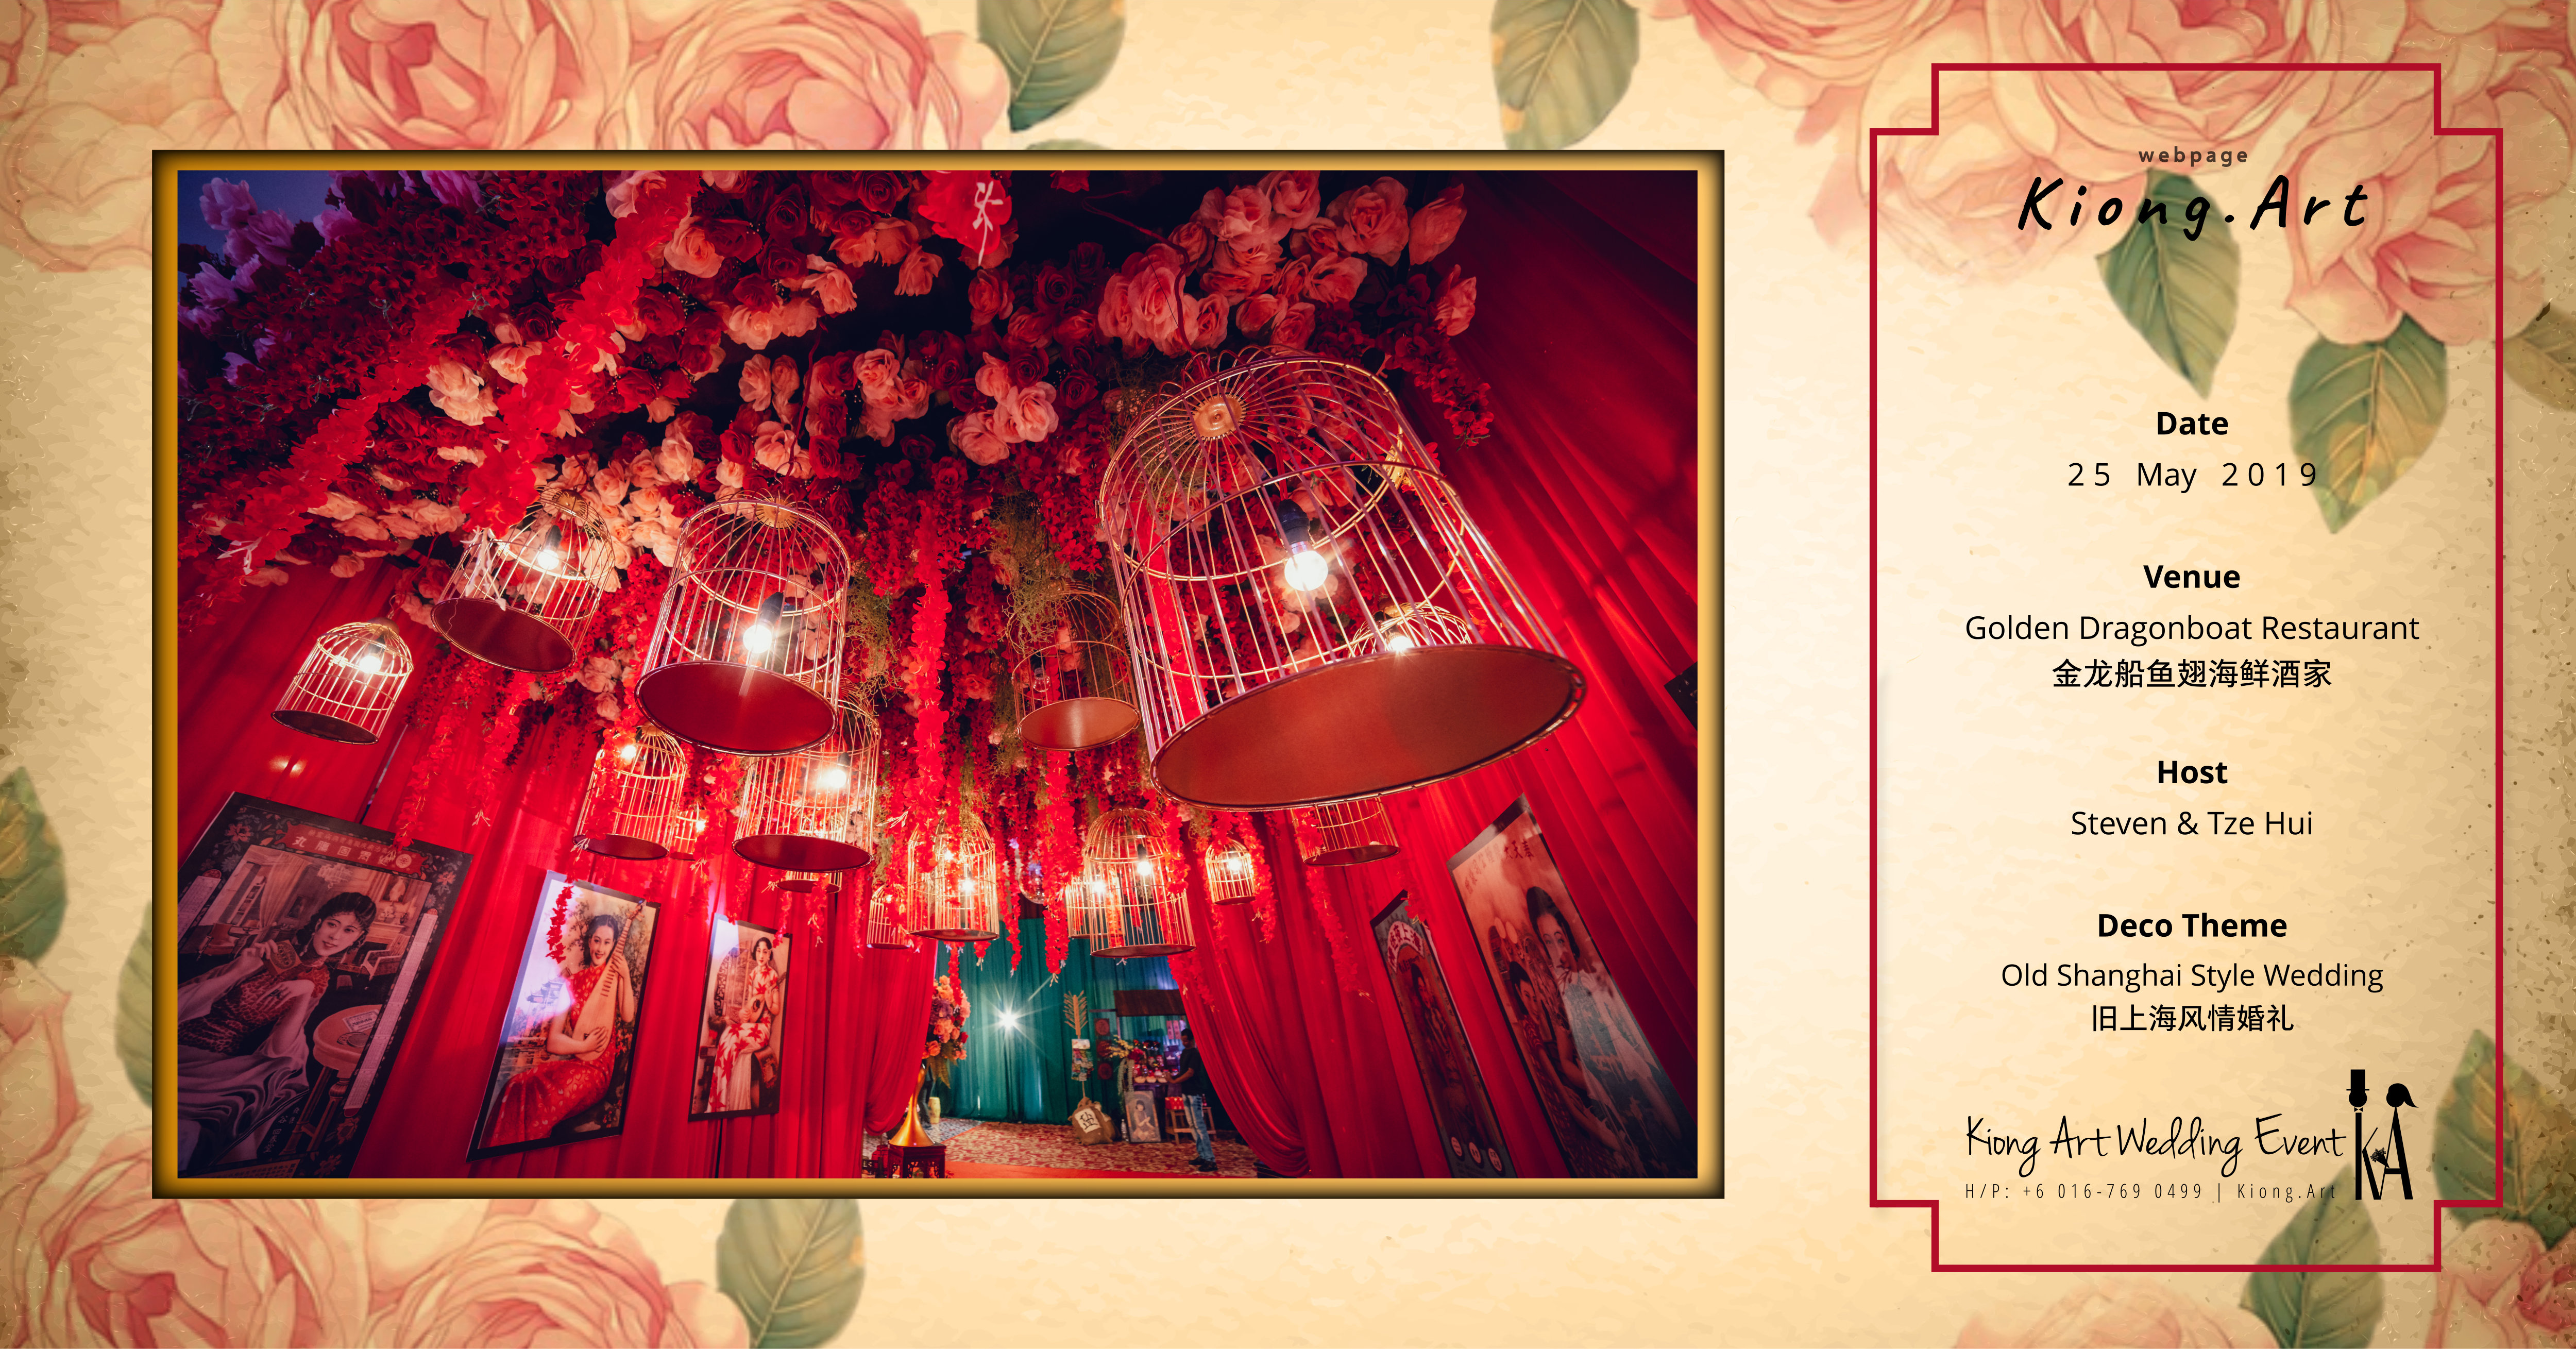 Kuala Lumpur Wedding Deco Decoration Kiong Art Wedding Deco Old Shanghai Style Wedding 旧上海风情婚礼 Steven and Tze Hui at Golden Dragonboat Restaurant 金龙船鱼翅海鲜酒家 Malaysia A16-B00-002